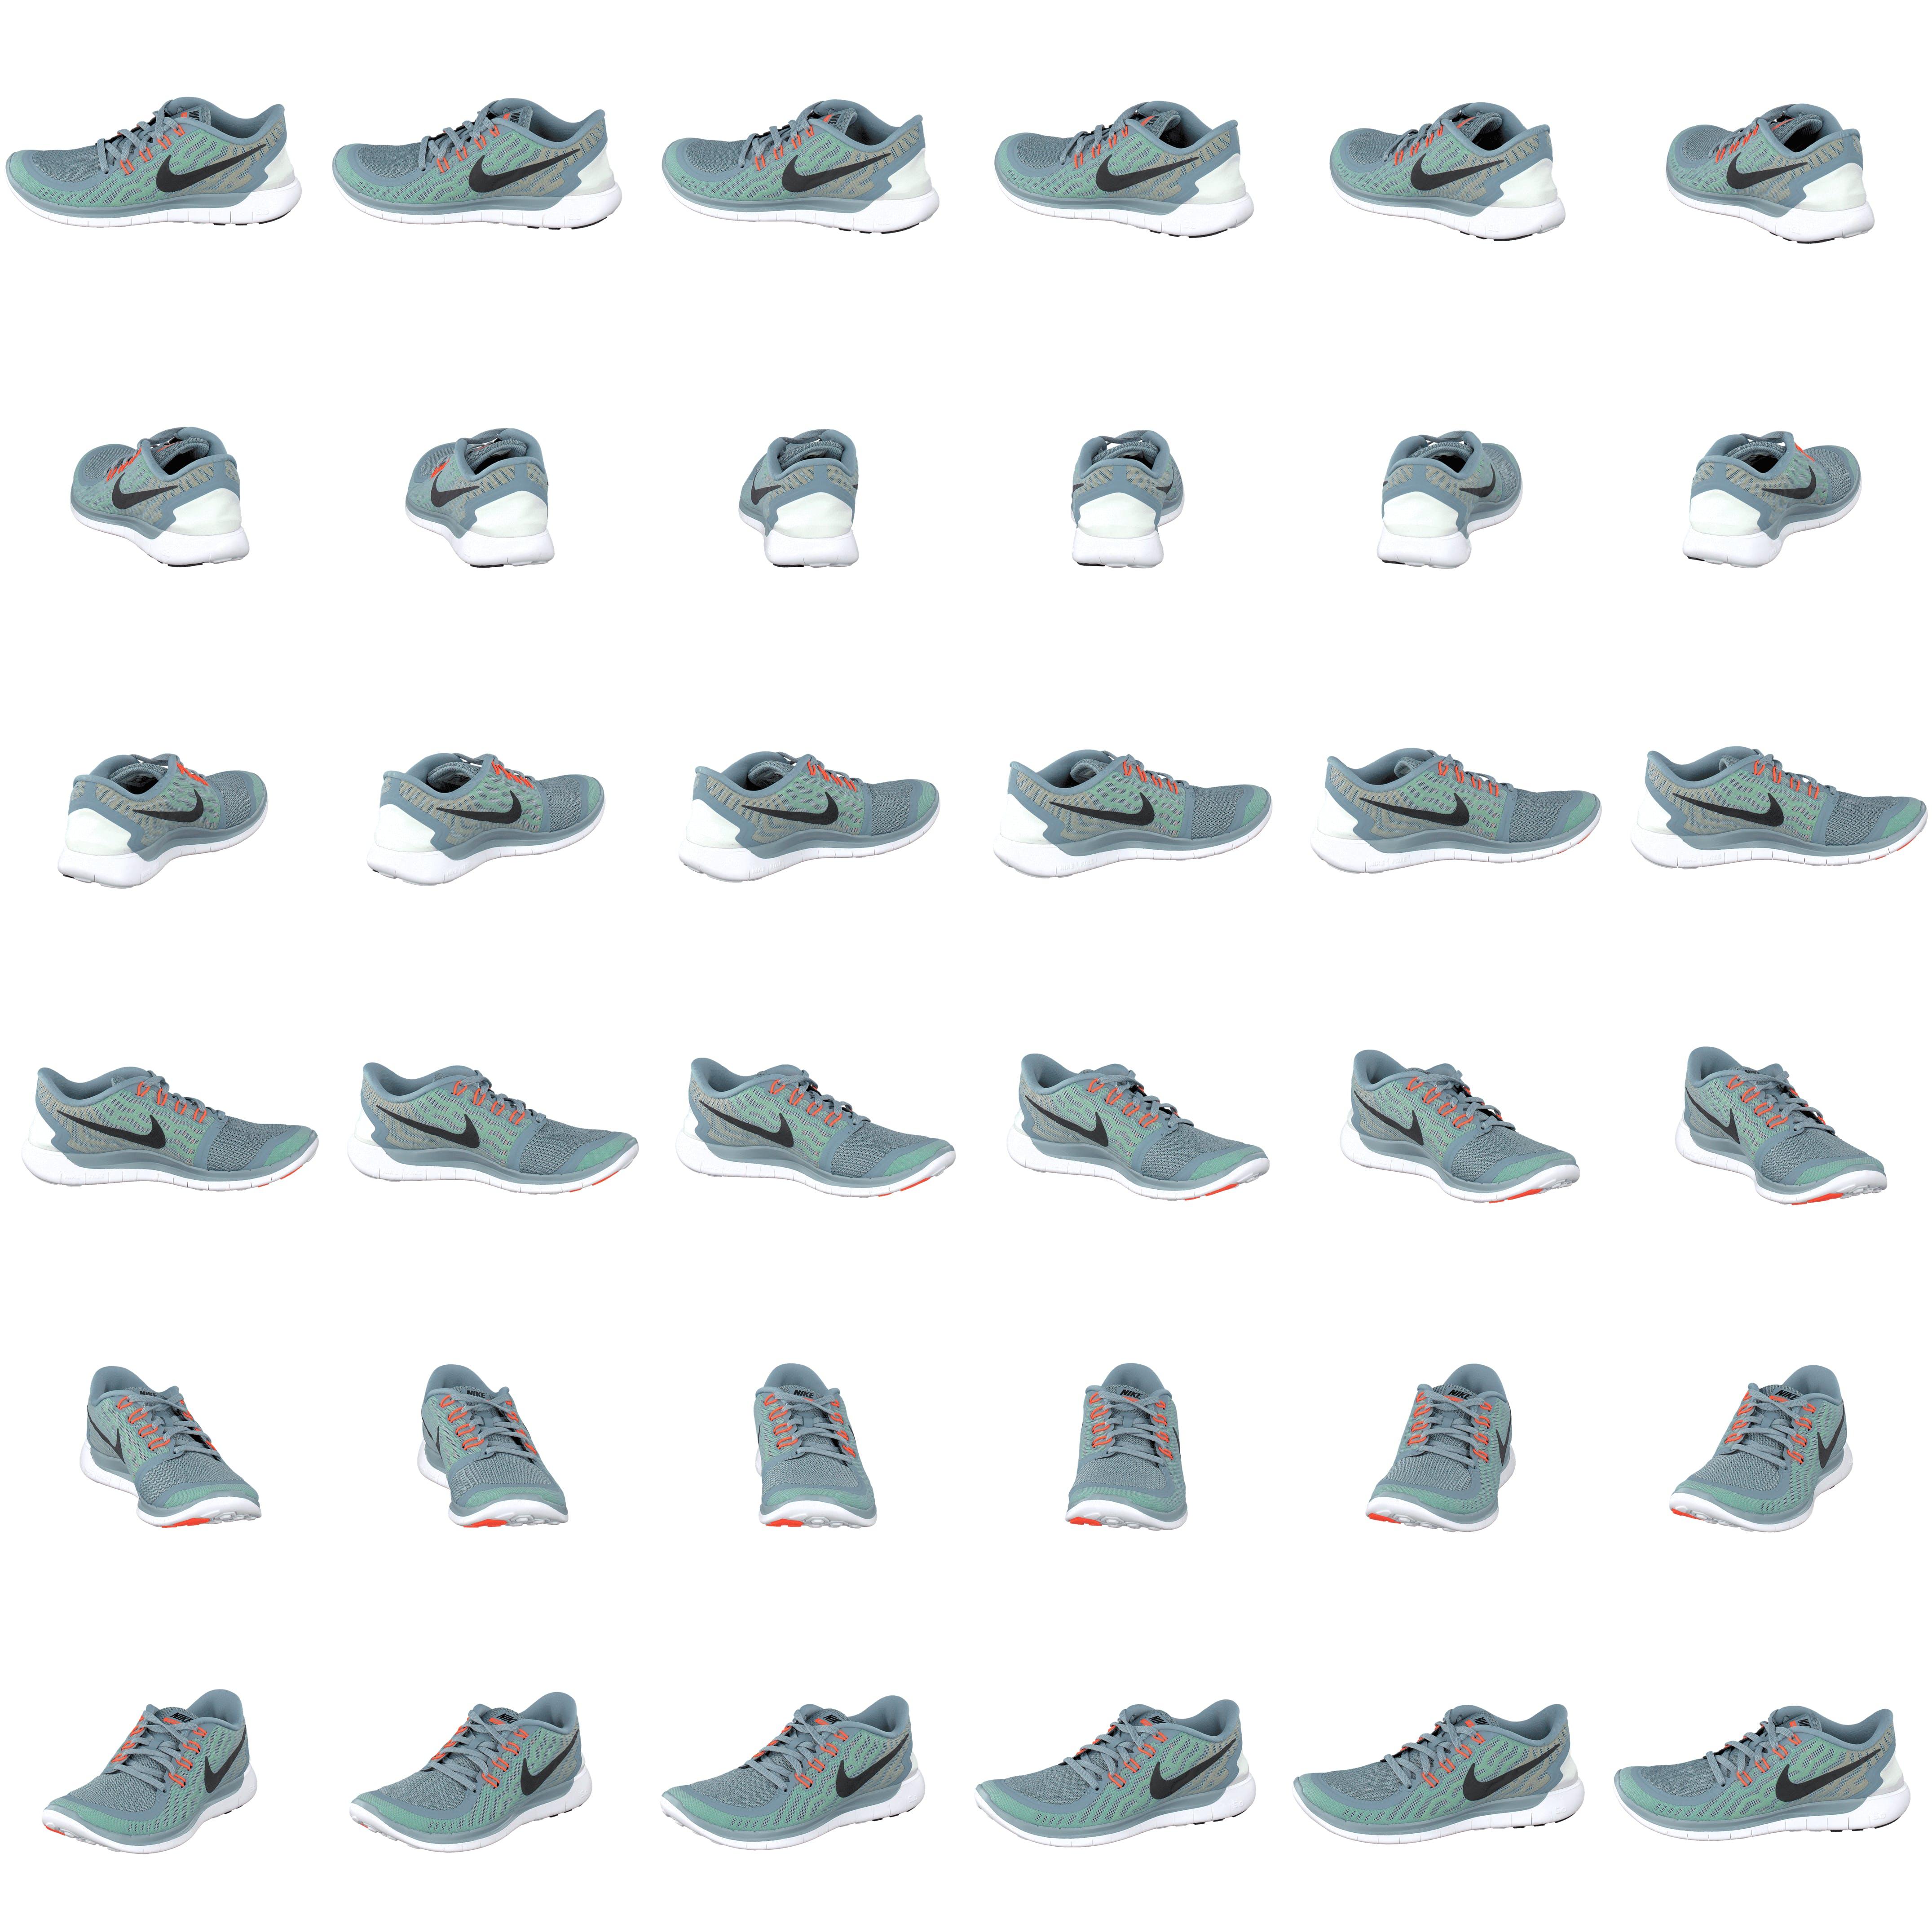 0cd2ca2537a Köp Nike Nike Free 5.0 Dove Grey/Black Electricgrn turkosa Skor Online |  FOOTWAY.se